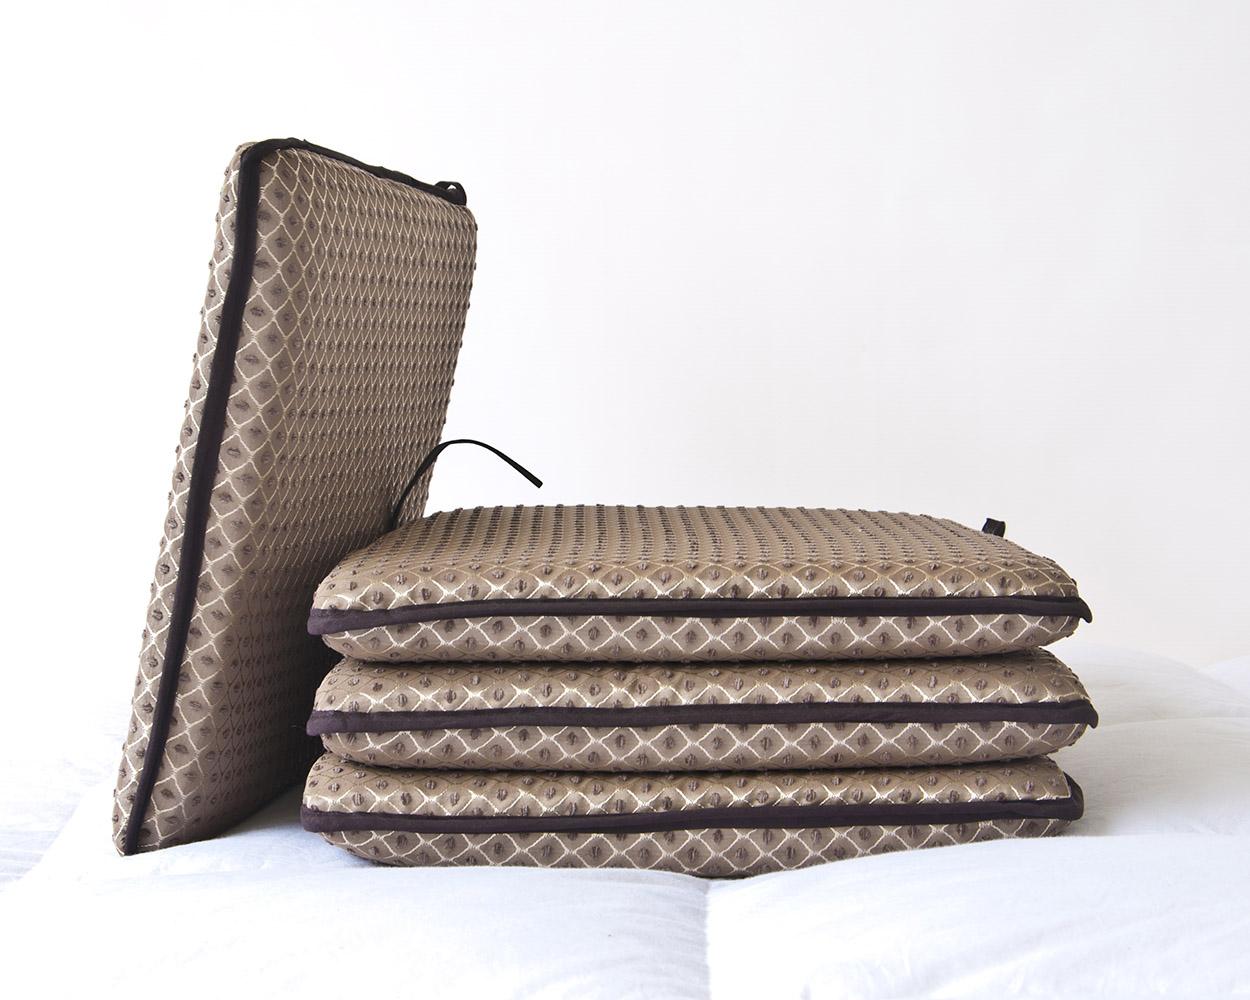 Diamond Design Sicily Dining Garden Chair Seat Pads In